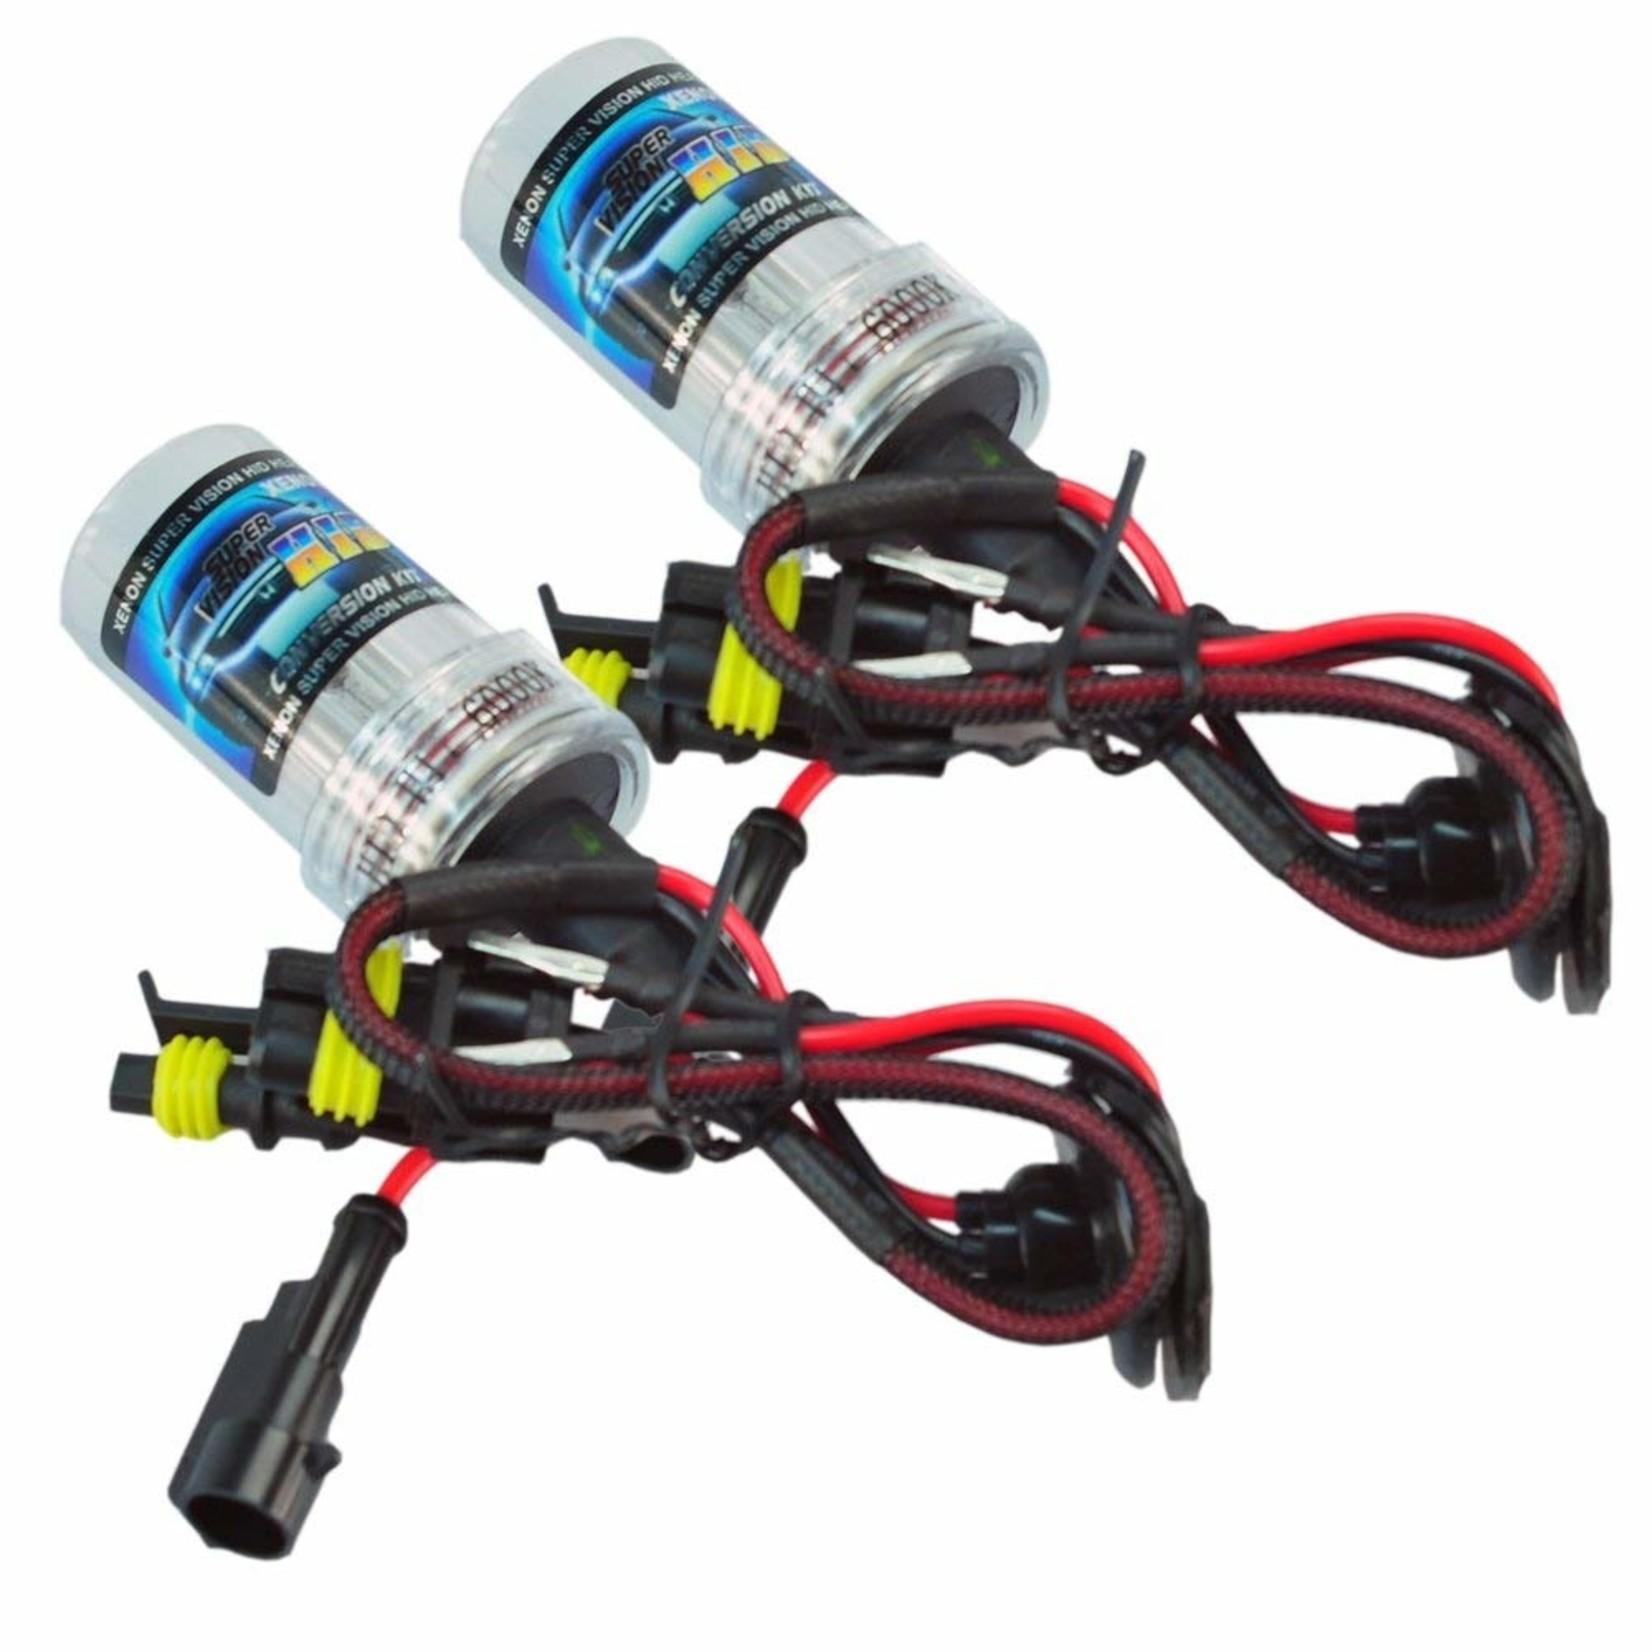 XEOD HB4/9006 Xenon vervangingslamp